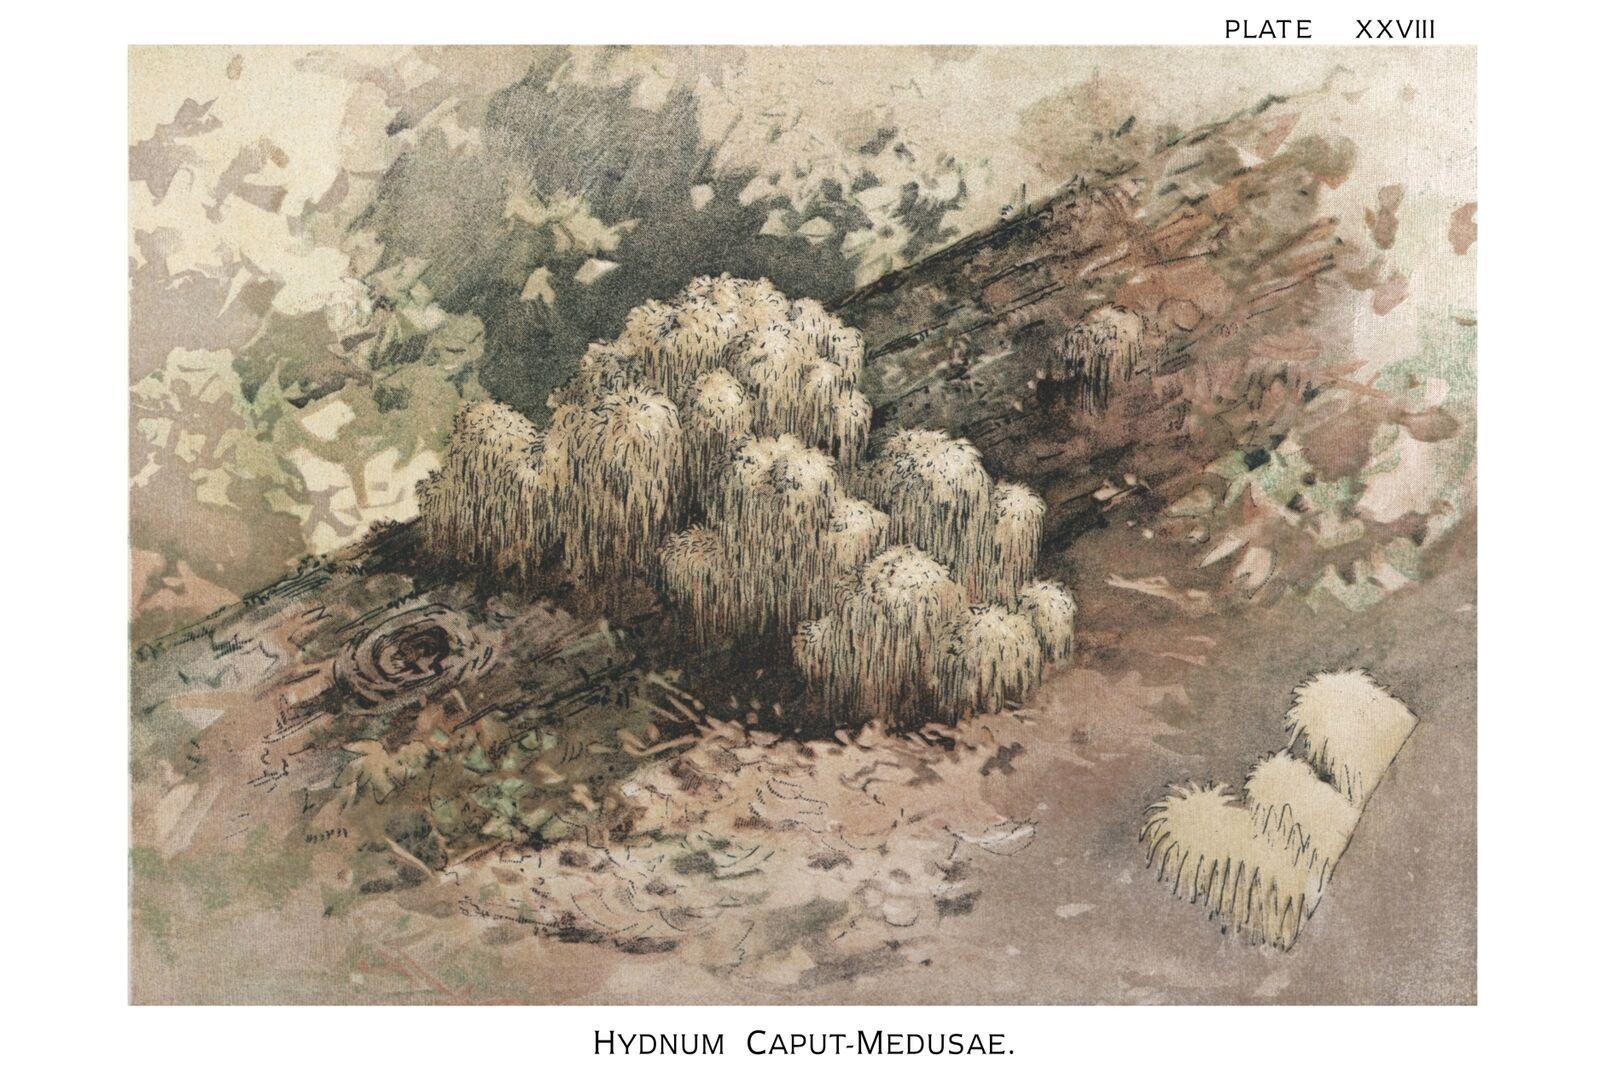 W. Hamilton Gibson: Hydnum Caput Medusae - Harper Publishers - 1895 - $12.82 - $19.75